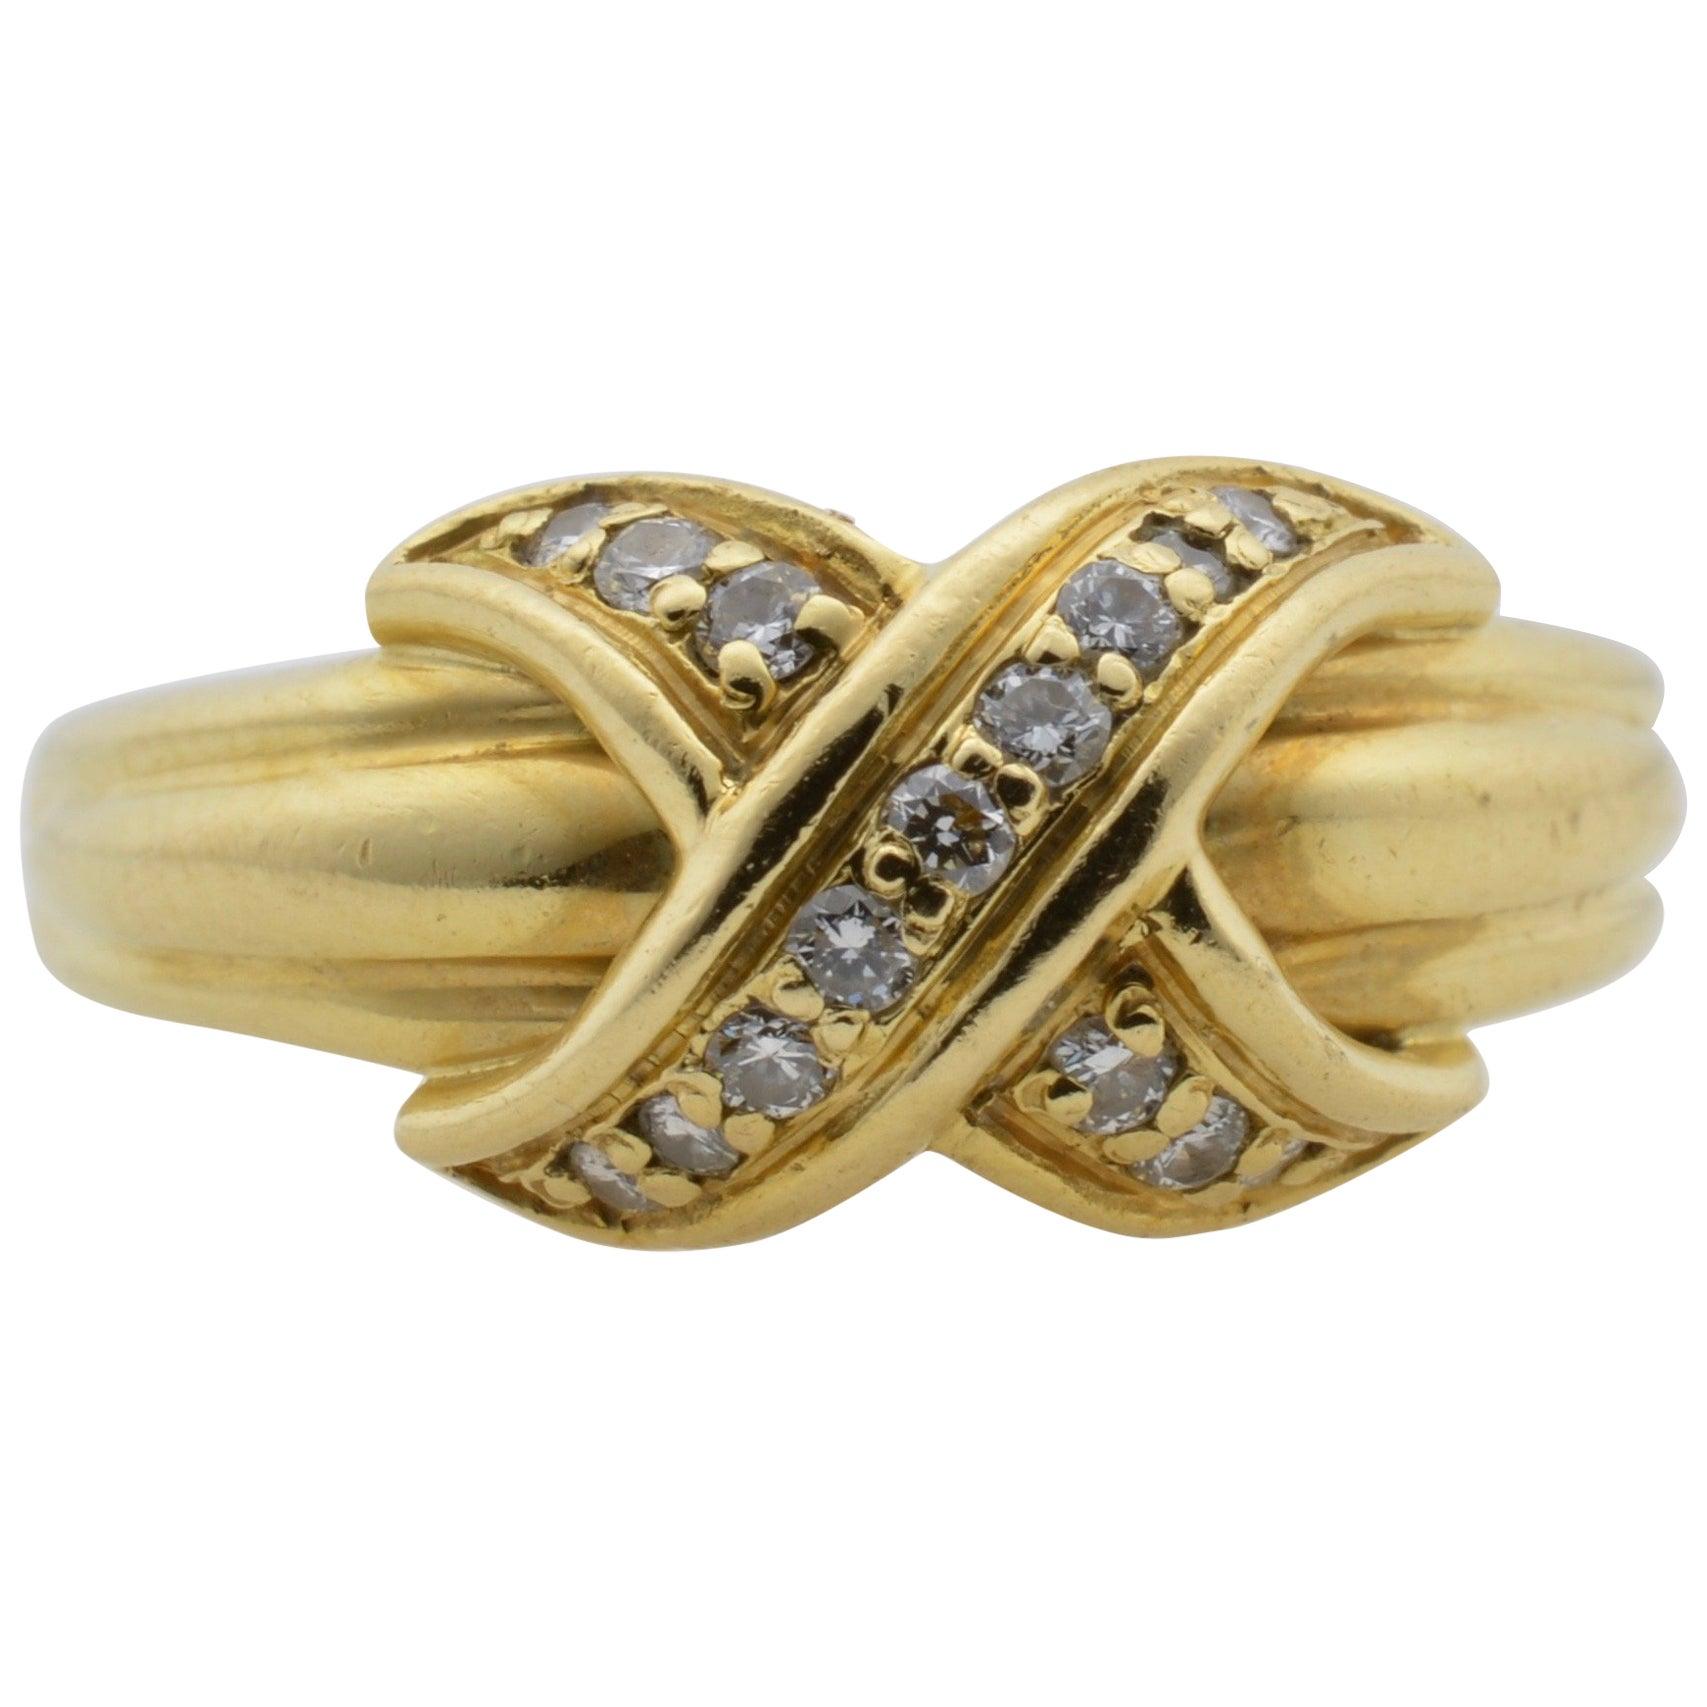 Tiffany & Co Yellow Gold 18 Karat and Diamond Ring 1990